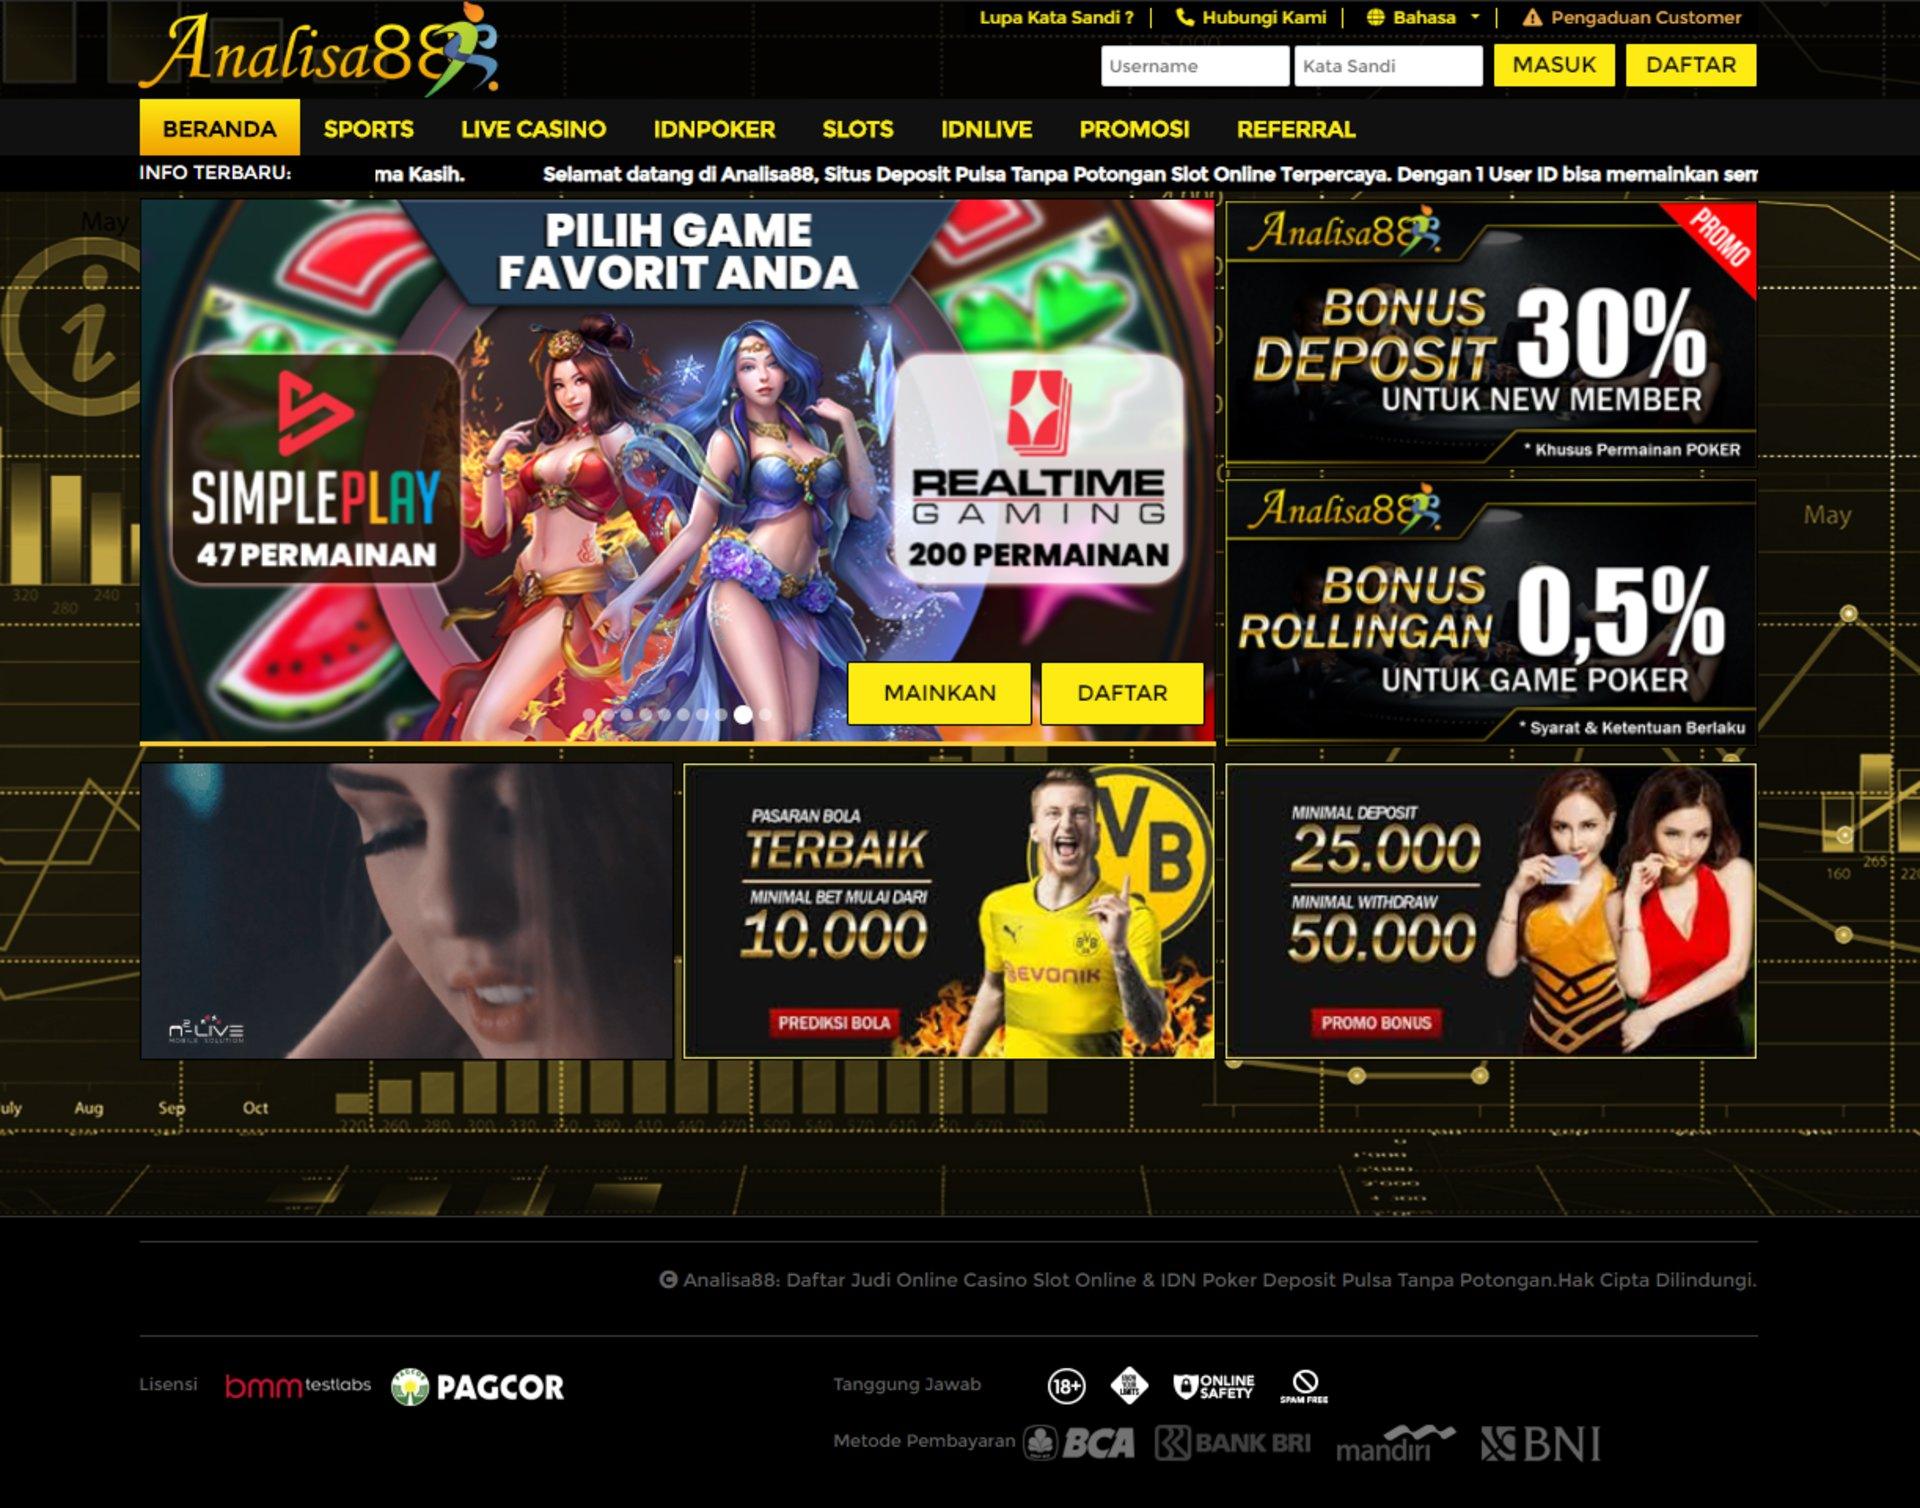 Gamewin88 Agen Slot Pulsa Tanpa Potongan Agen Slot Online Deposit Pulsa Tanpa Potongan